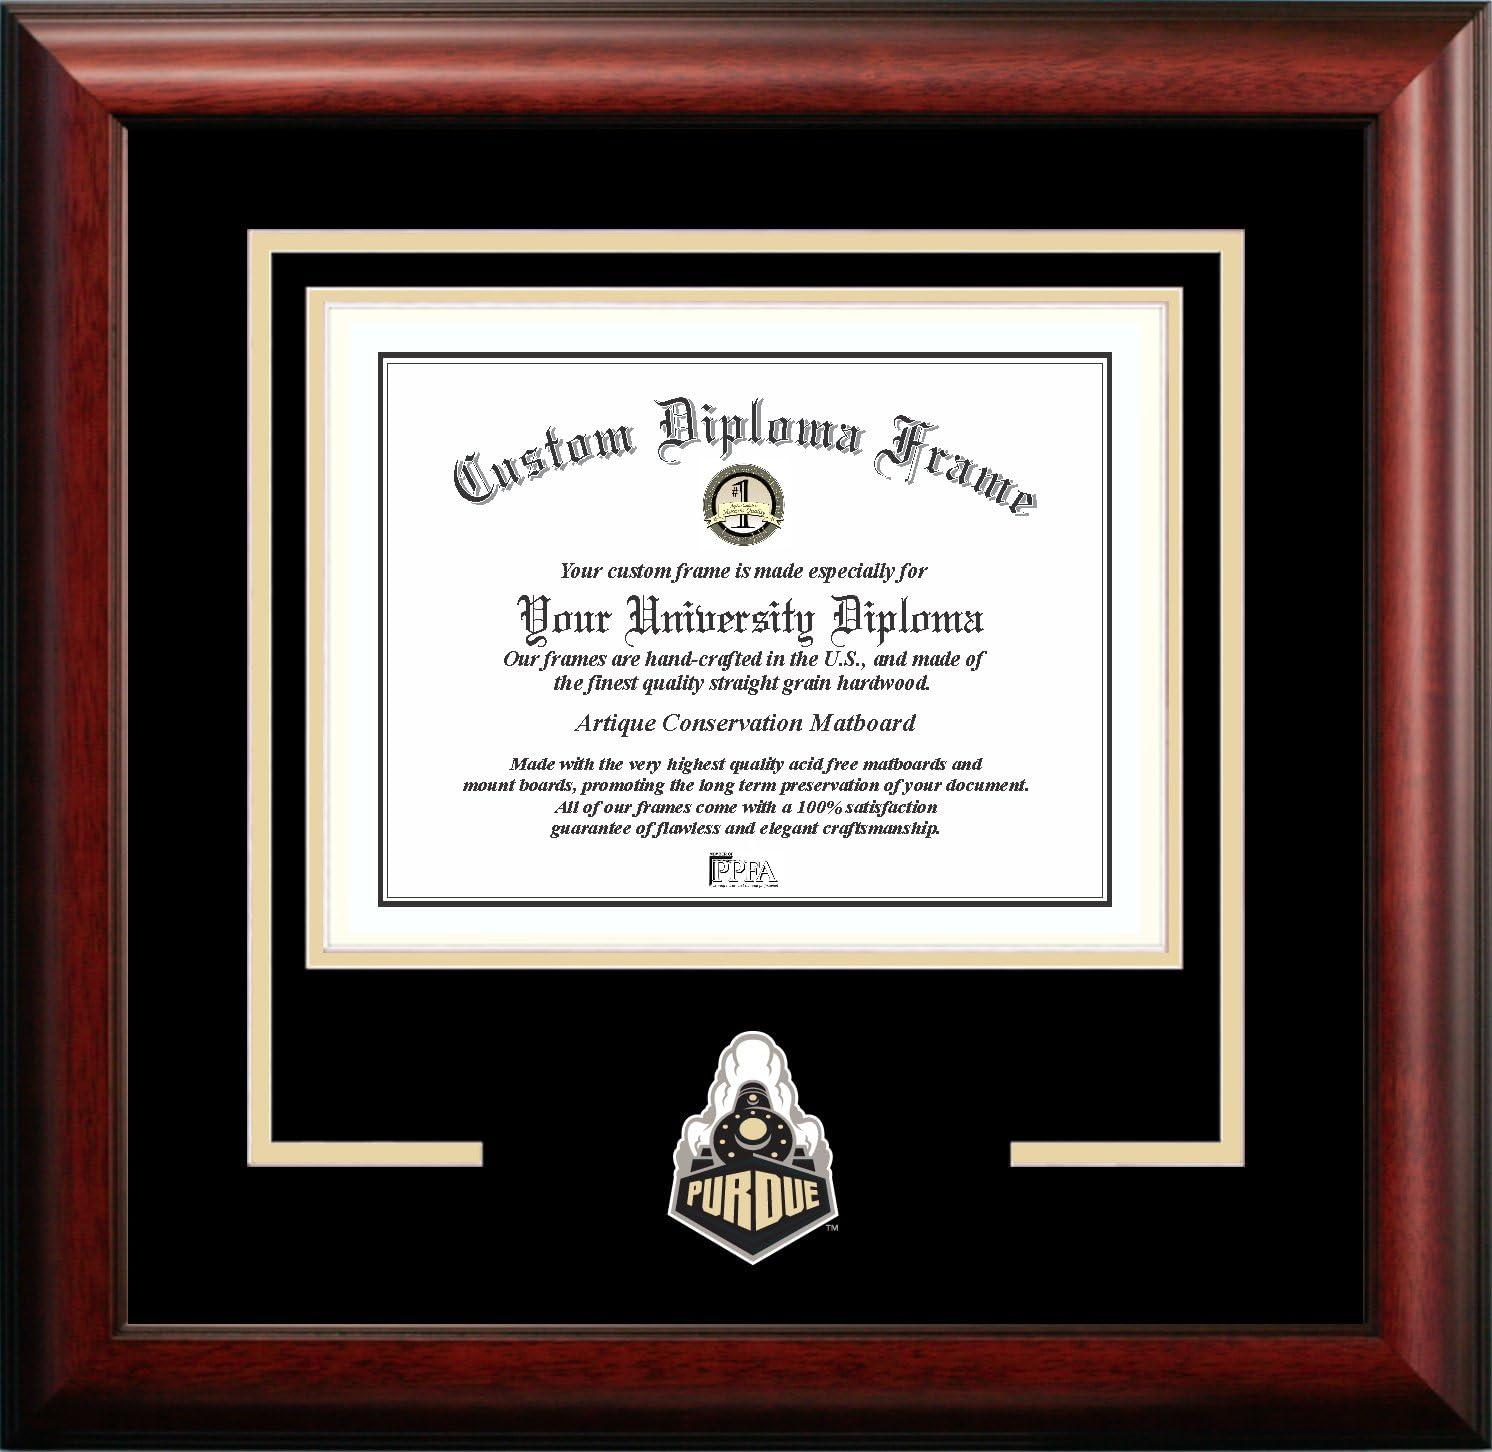 Campus Images NCAA Spirit Diploma Frame